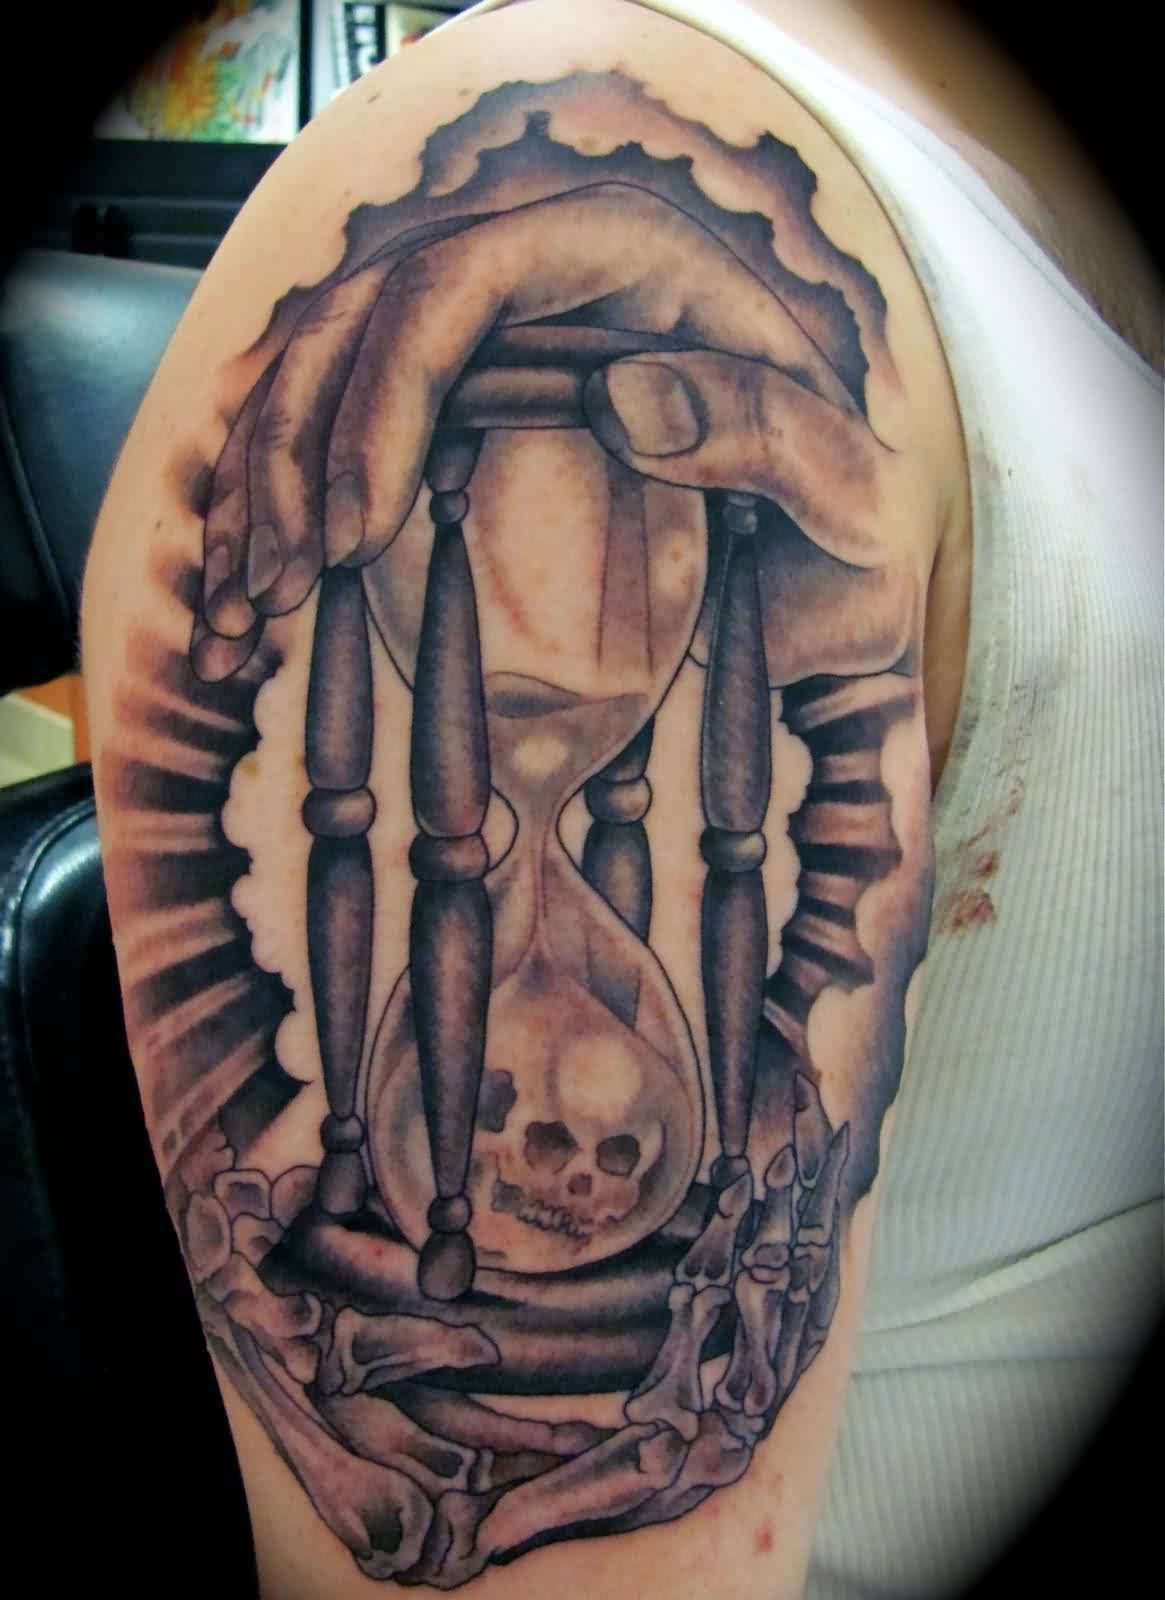 Full Sleeve Tattoo Definition: Black And Grey Skull In Hourglass Tattoo On Half Sleeve